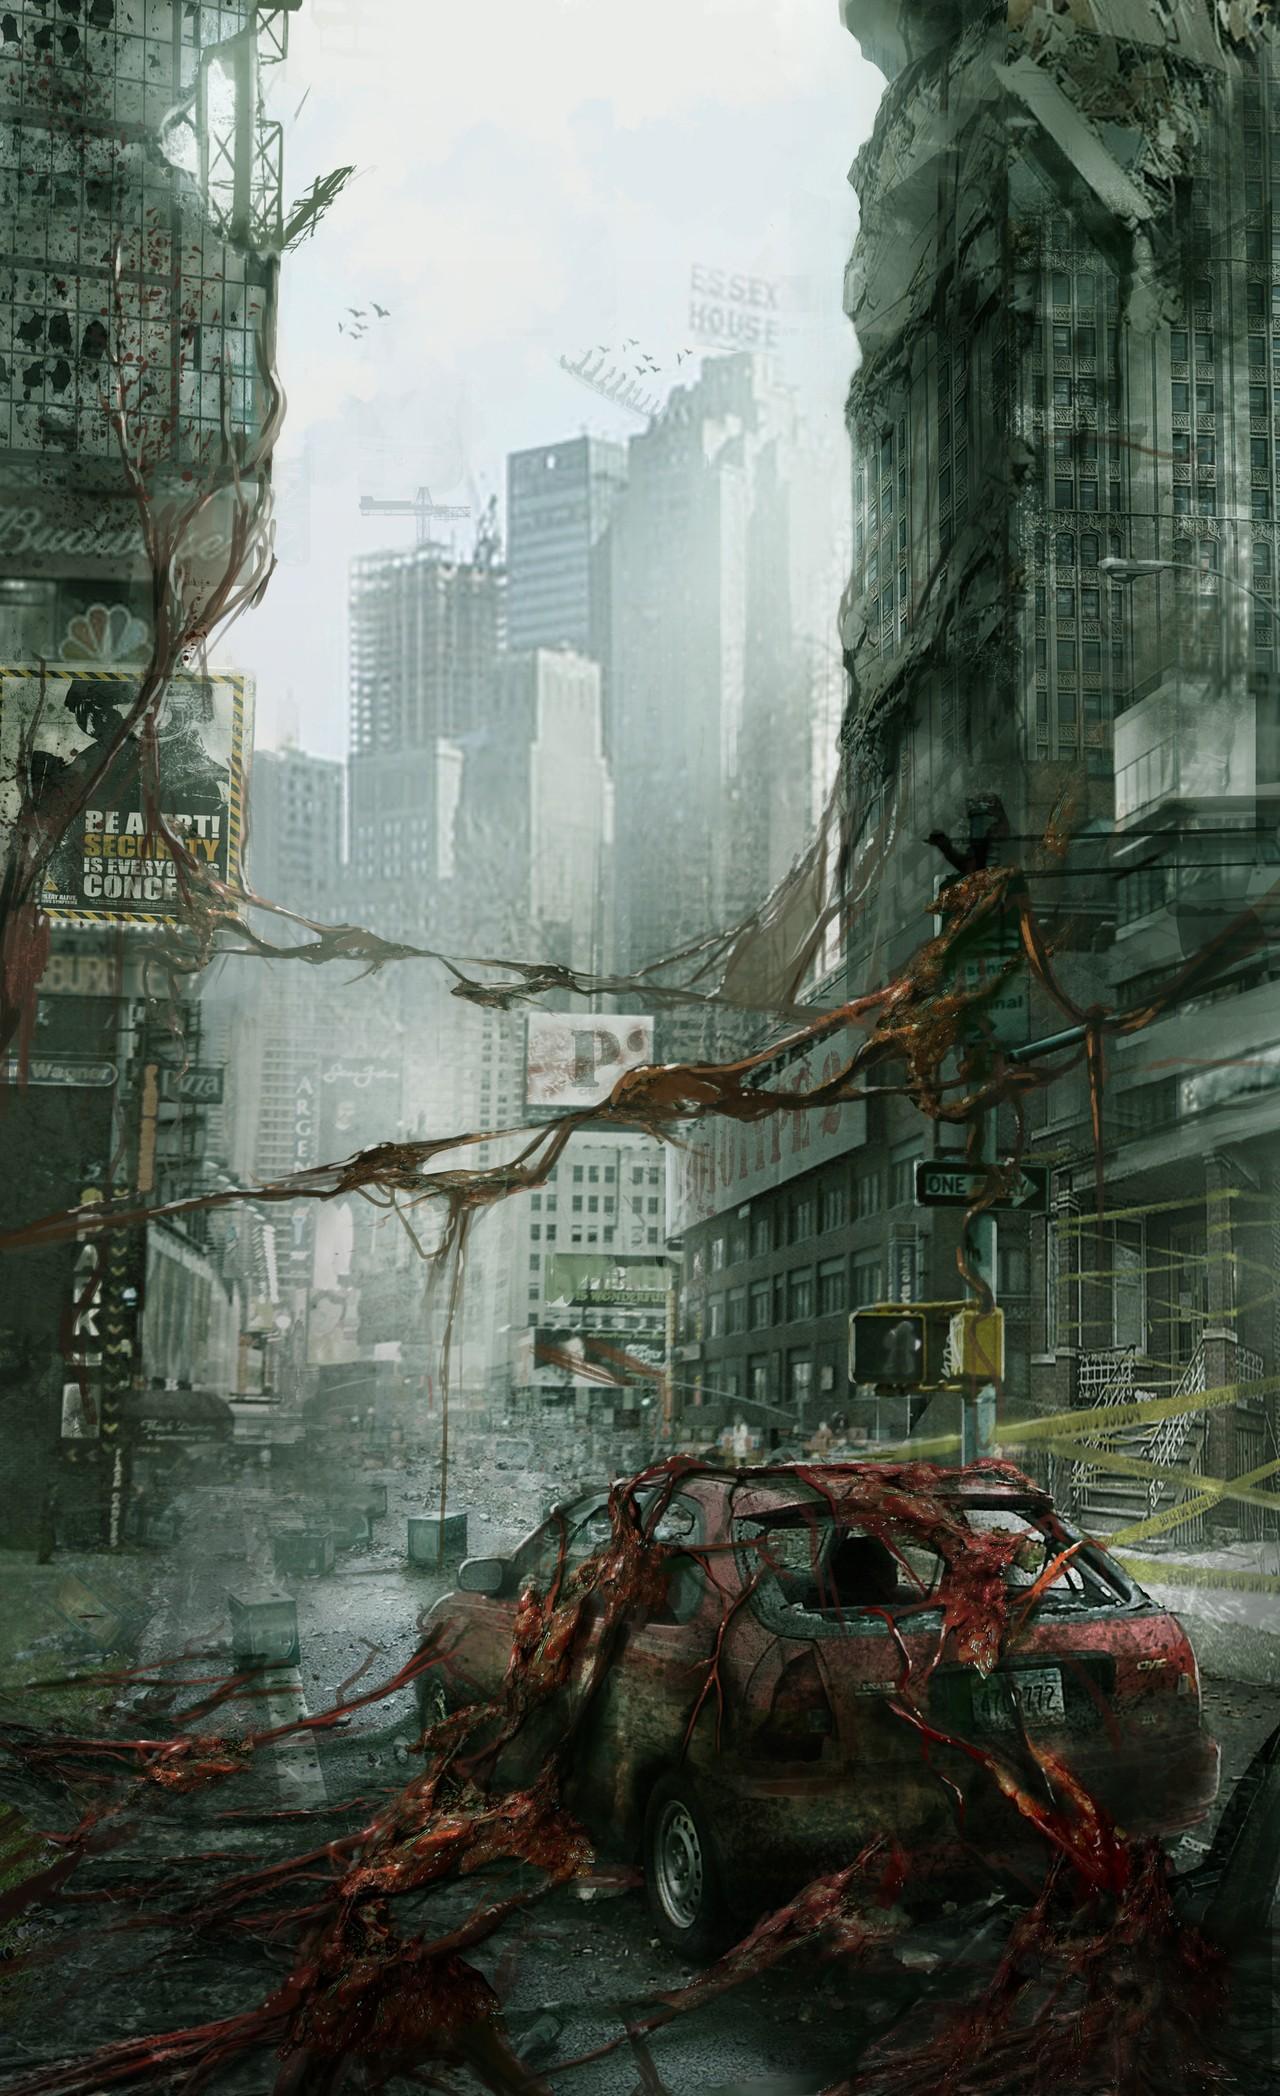 Красная зона - Нью-Йорк (New York City) - Значимые места - Prototype